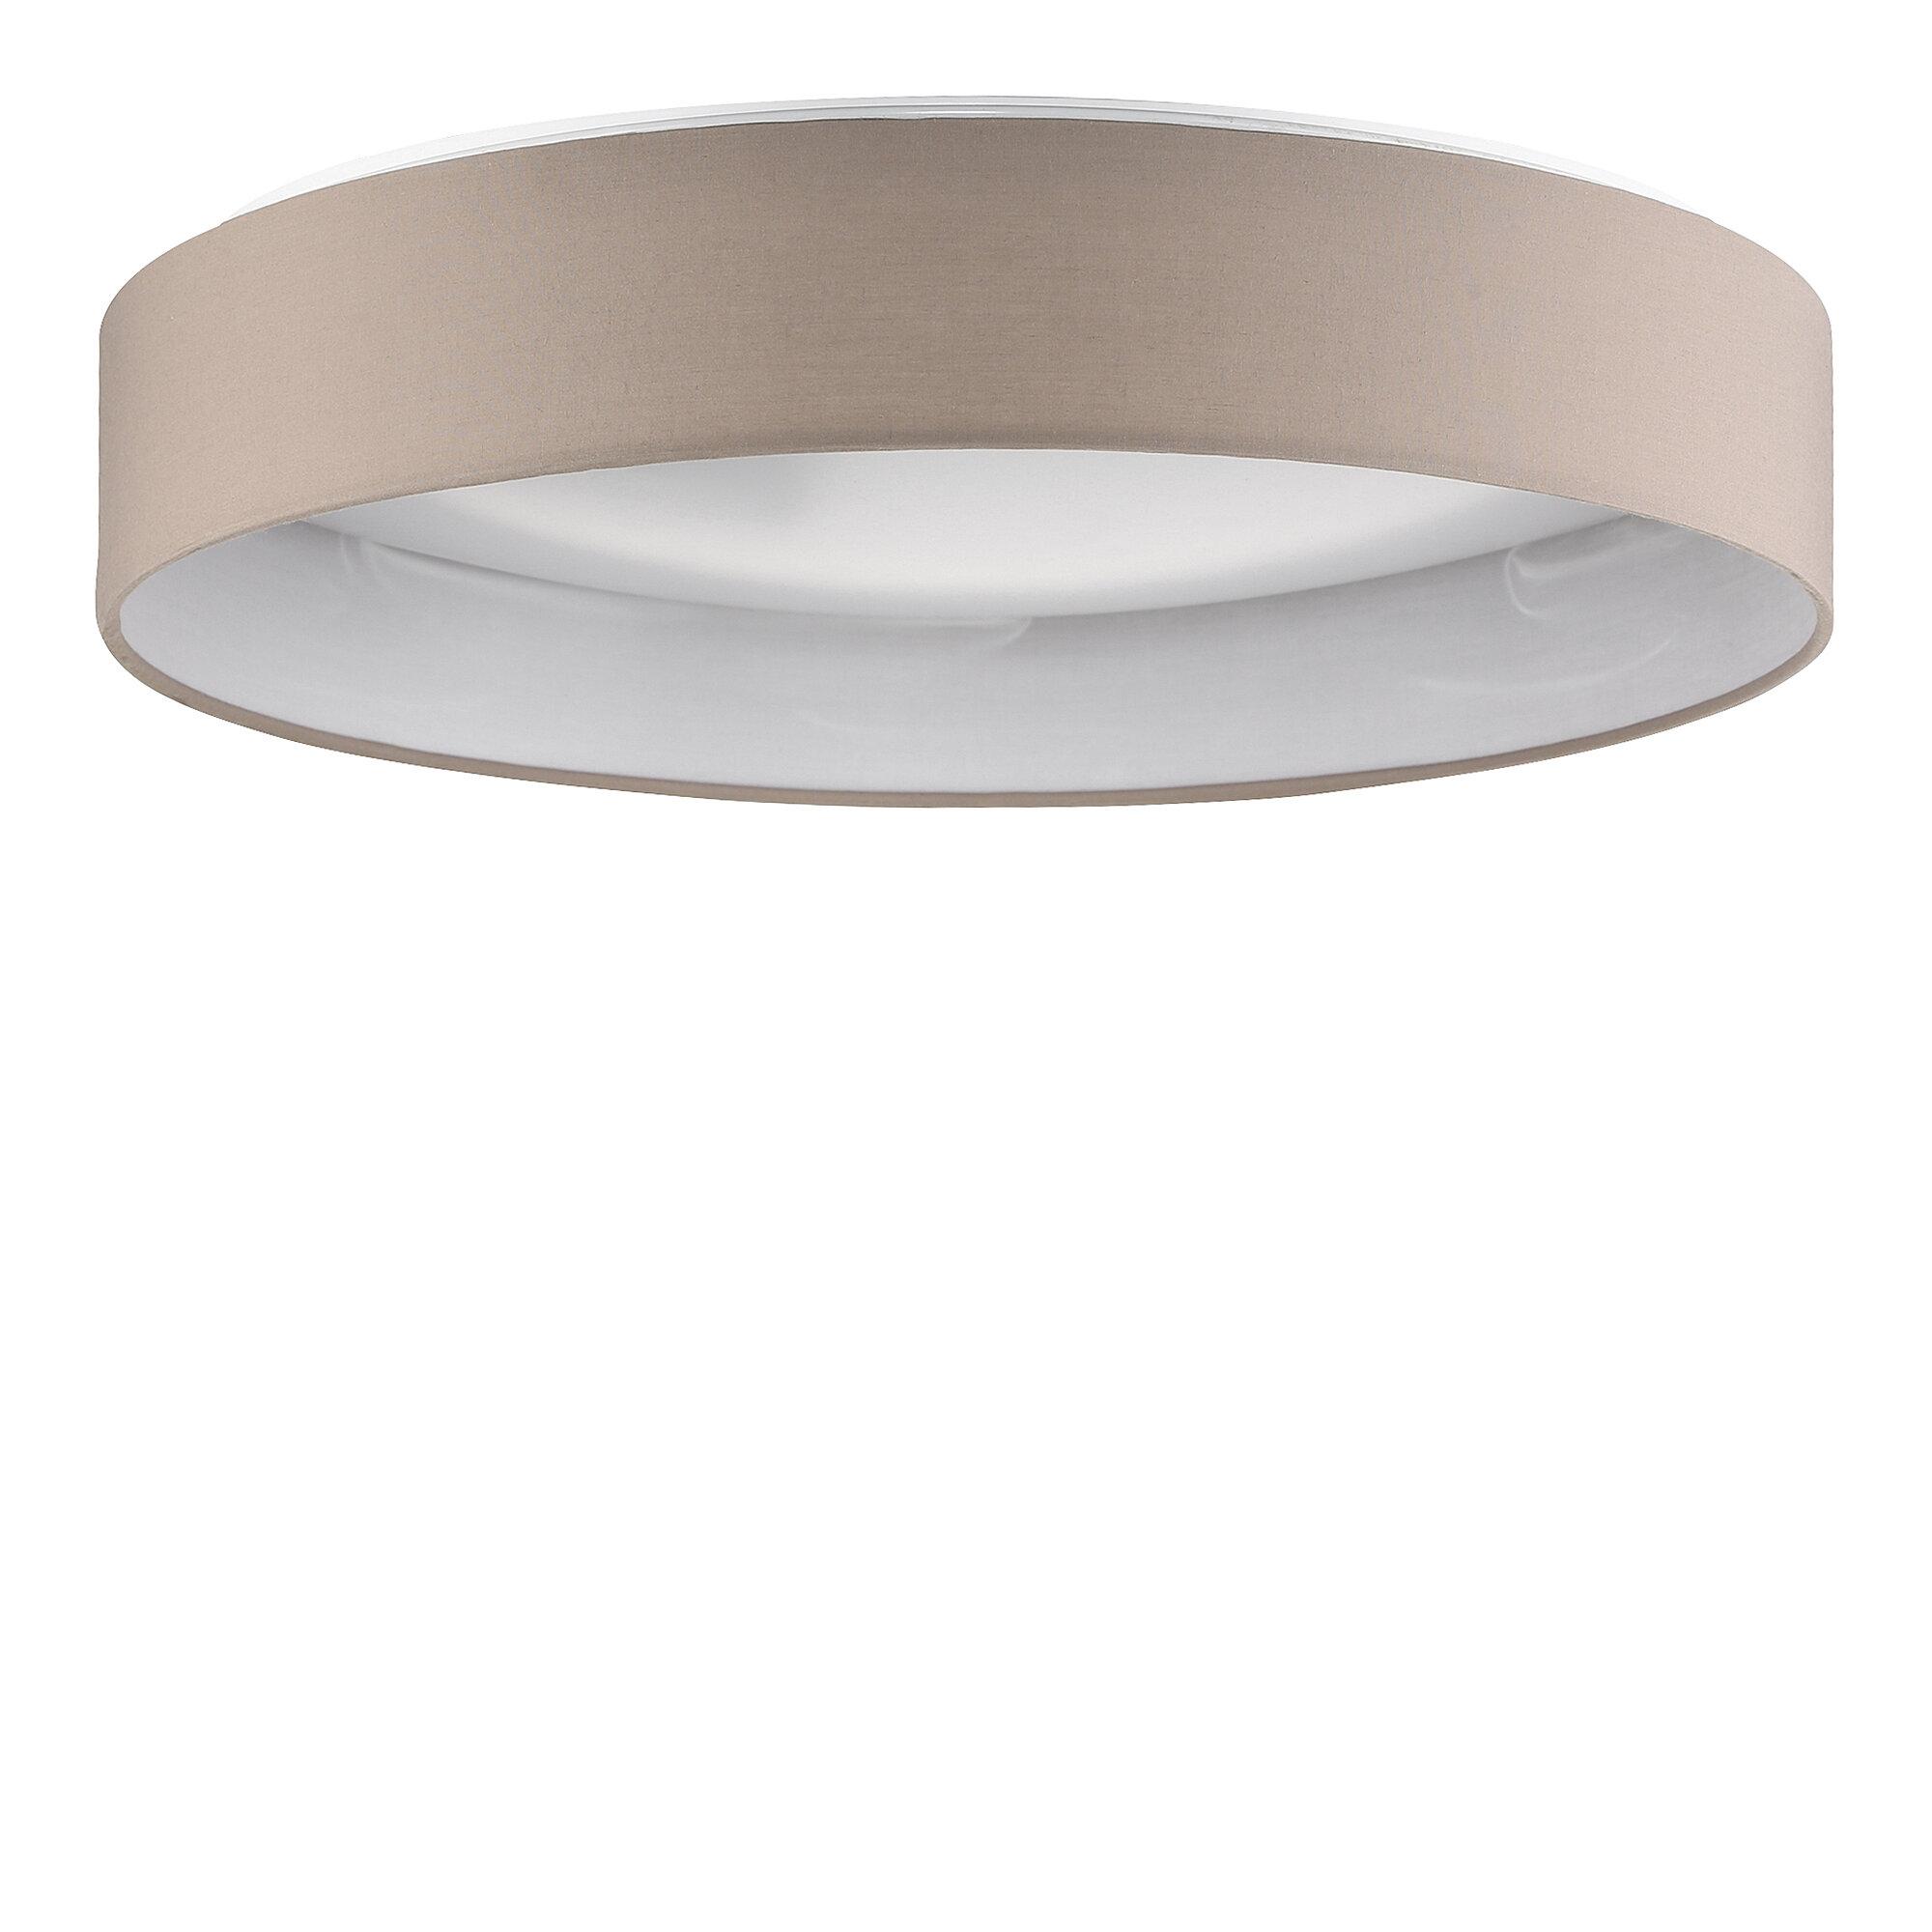 Zipcode Design Carley 1 Light Led Flush Mount Reviews Wayfair Co Uk